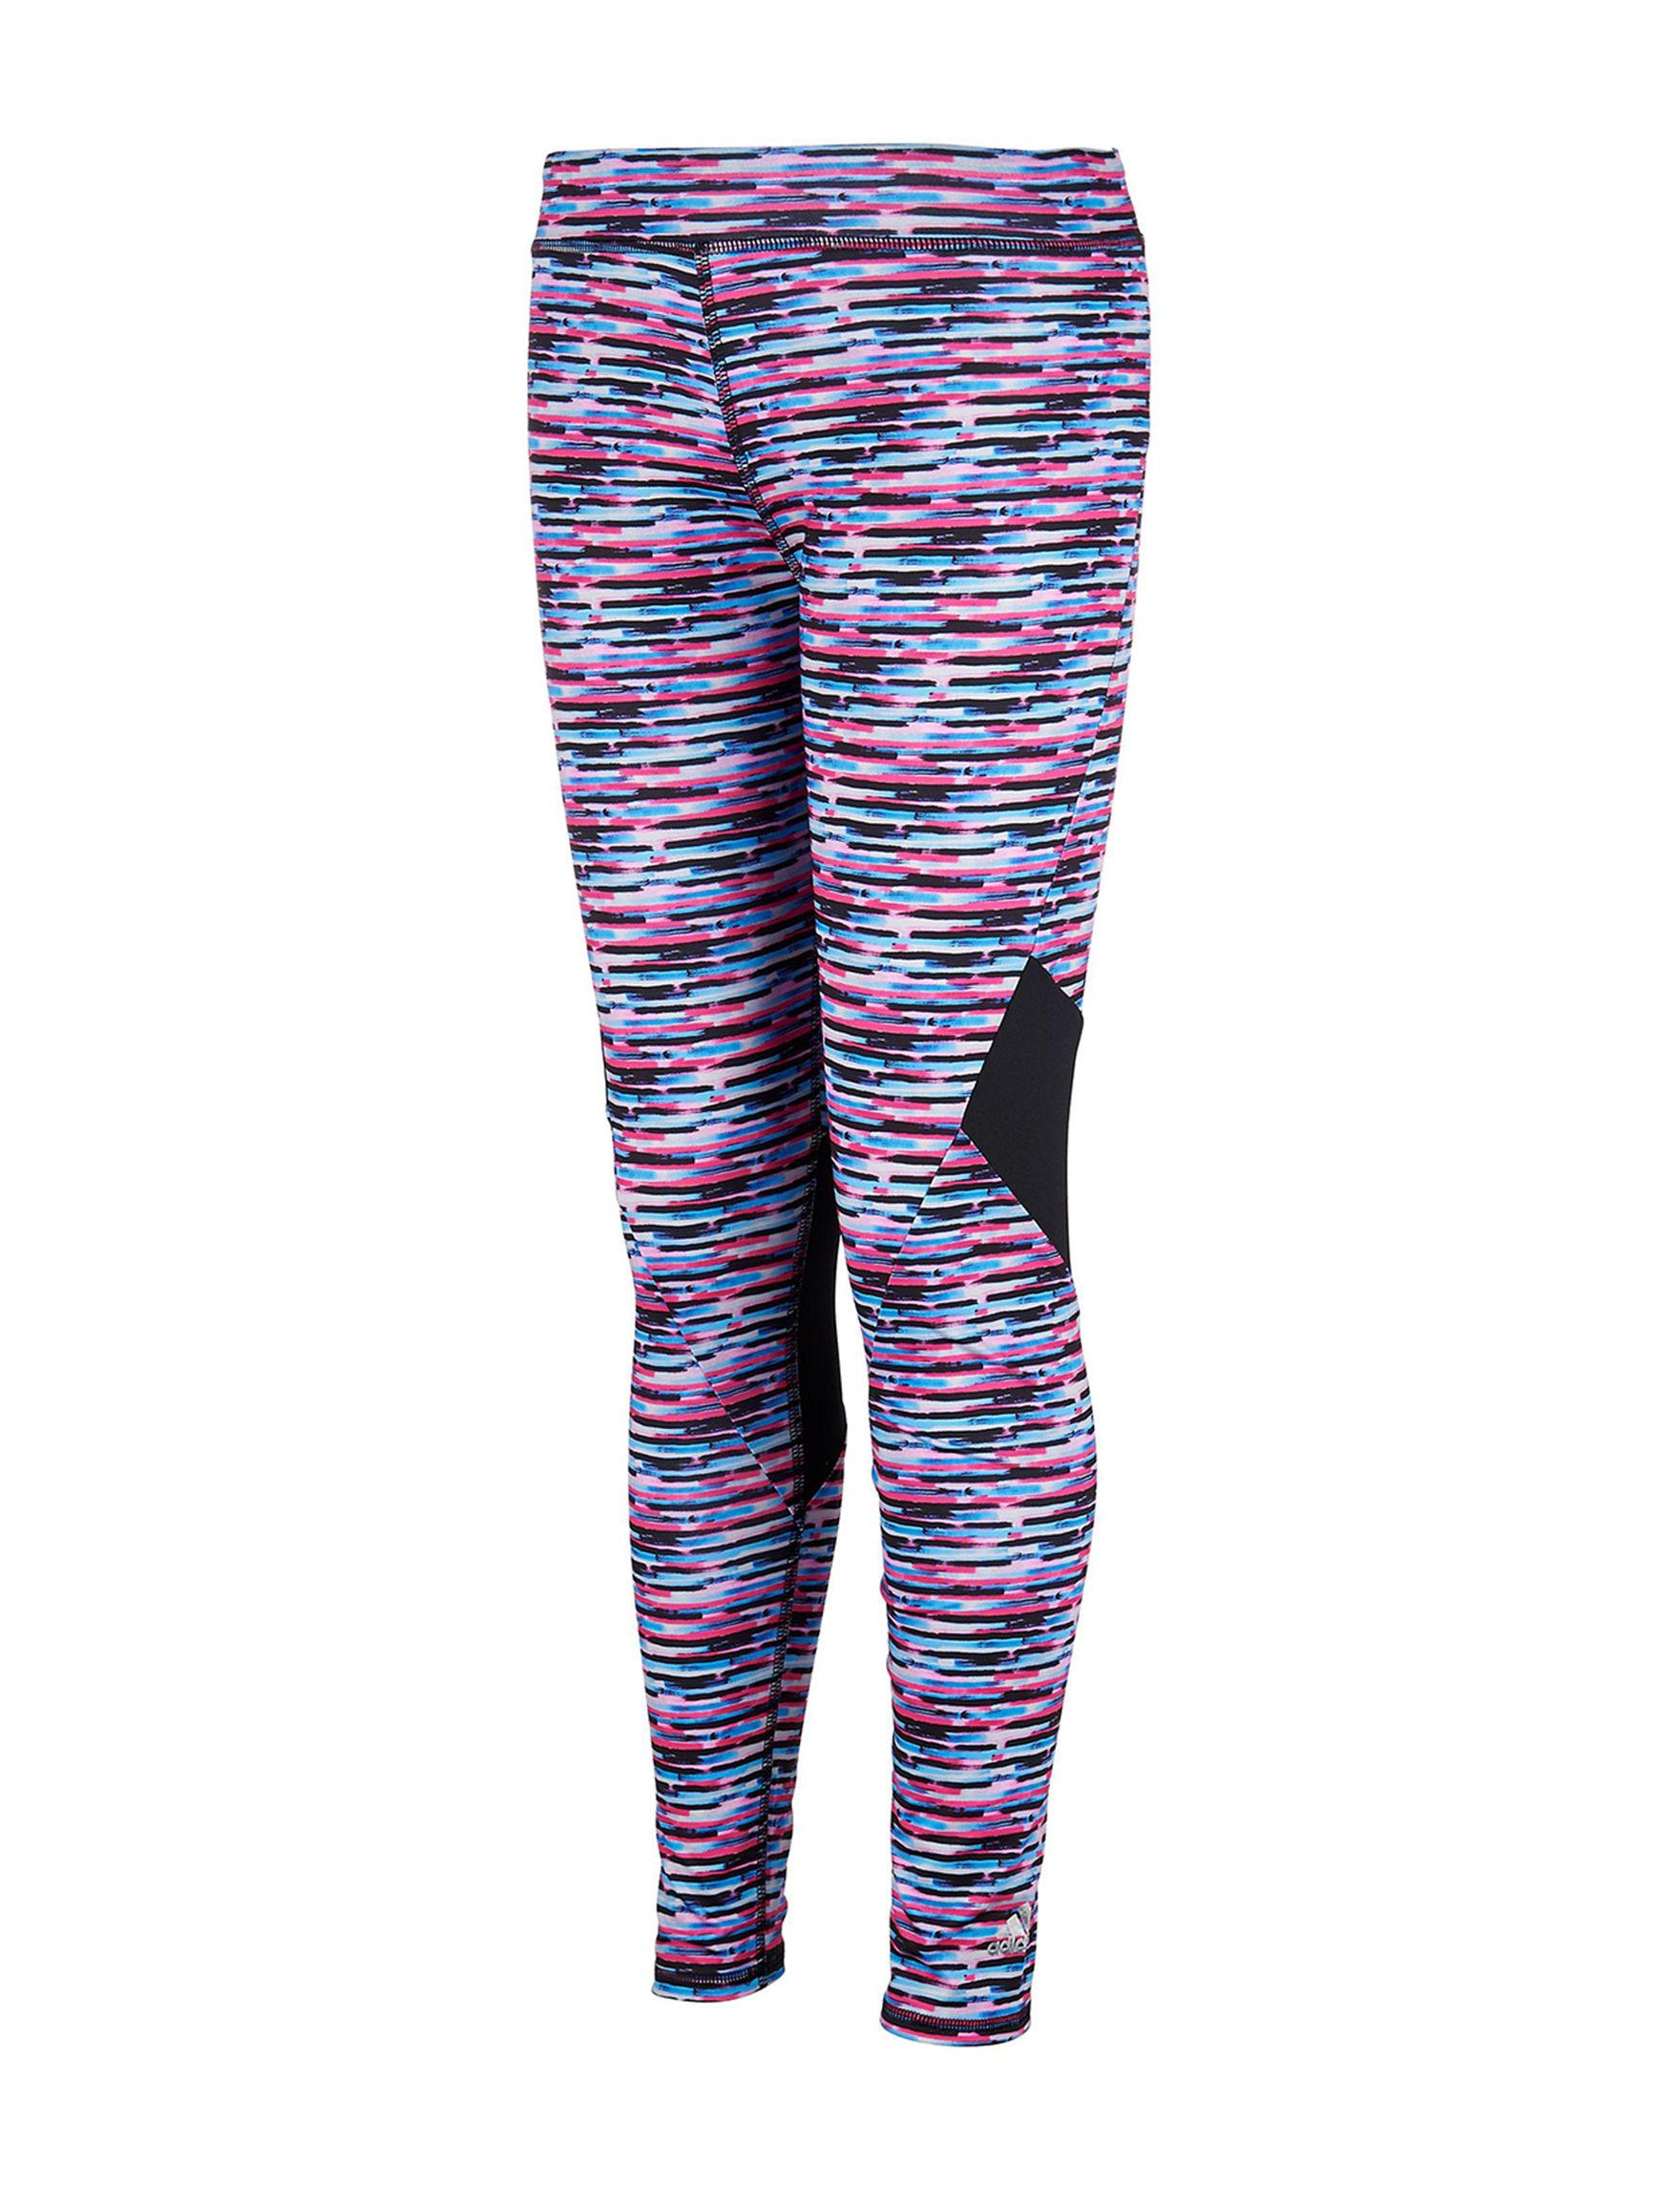 Adidas Pink Multi